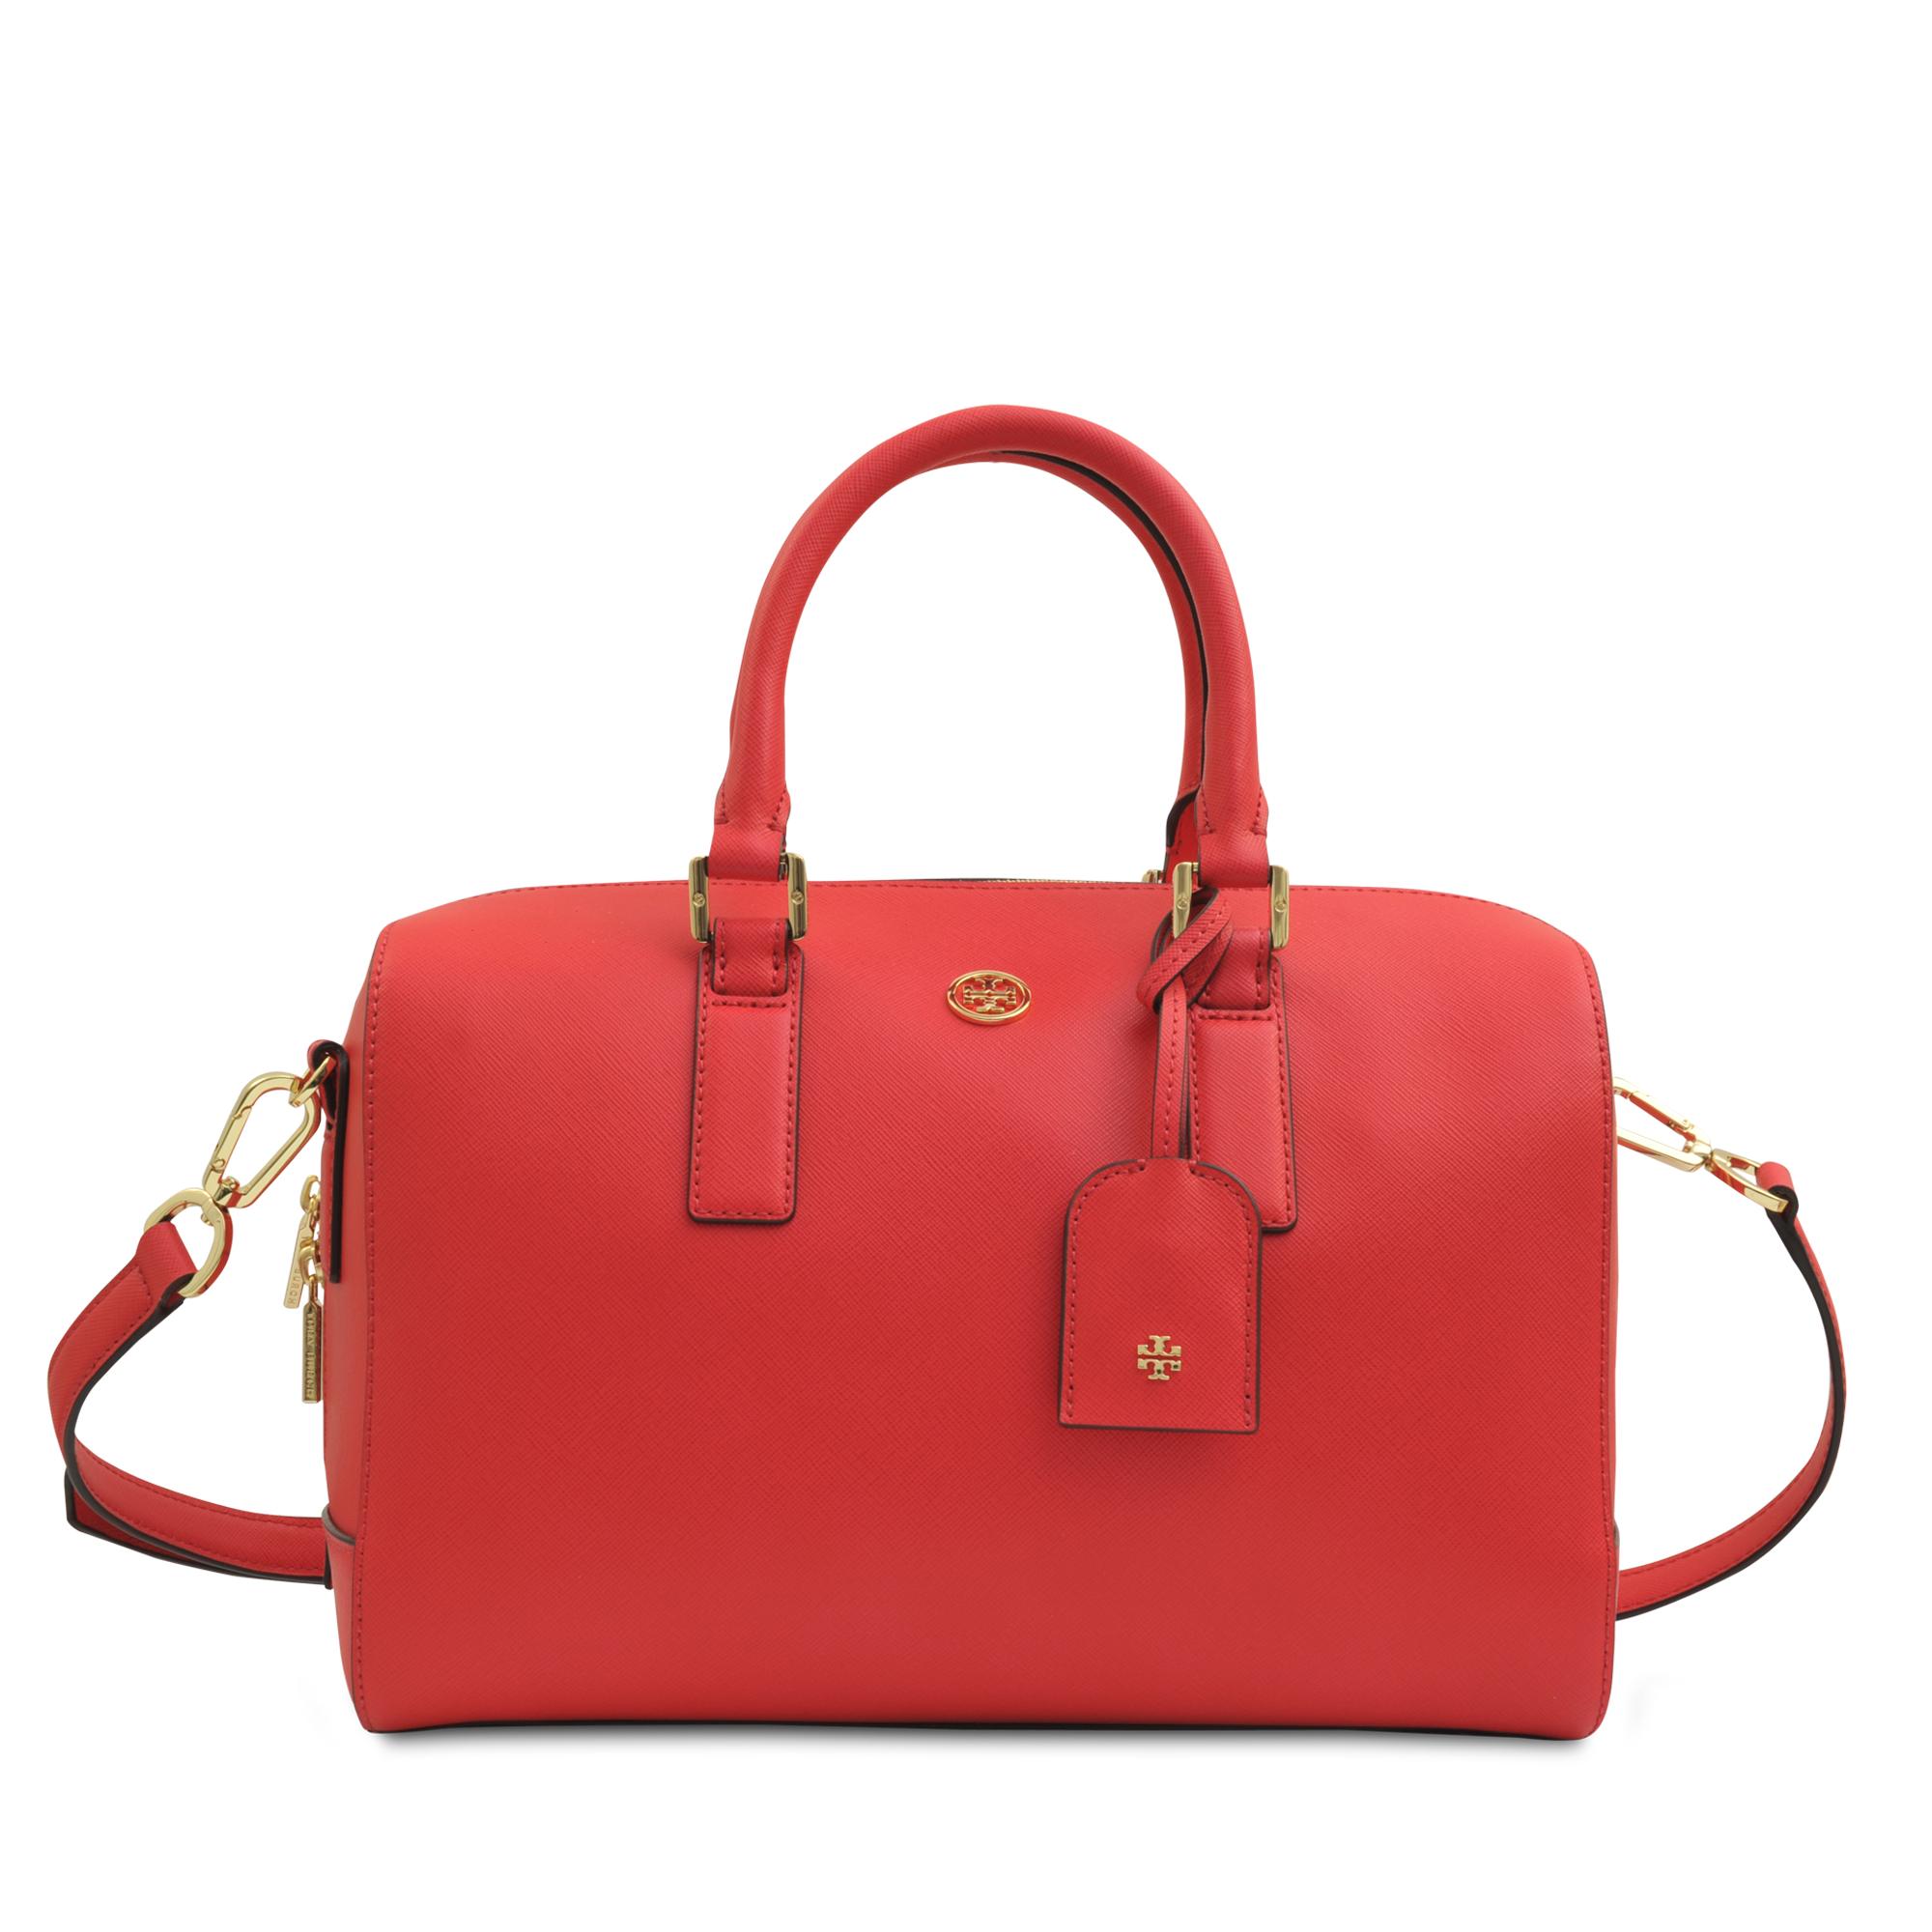 Caractere HANDBAGS - Handbags su YOOX.COM qixjJe16Kj